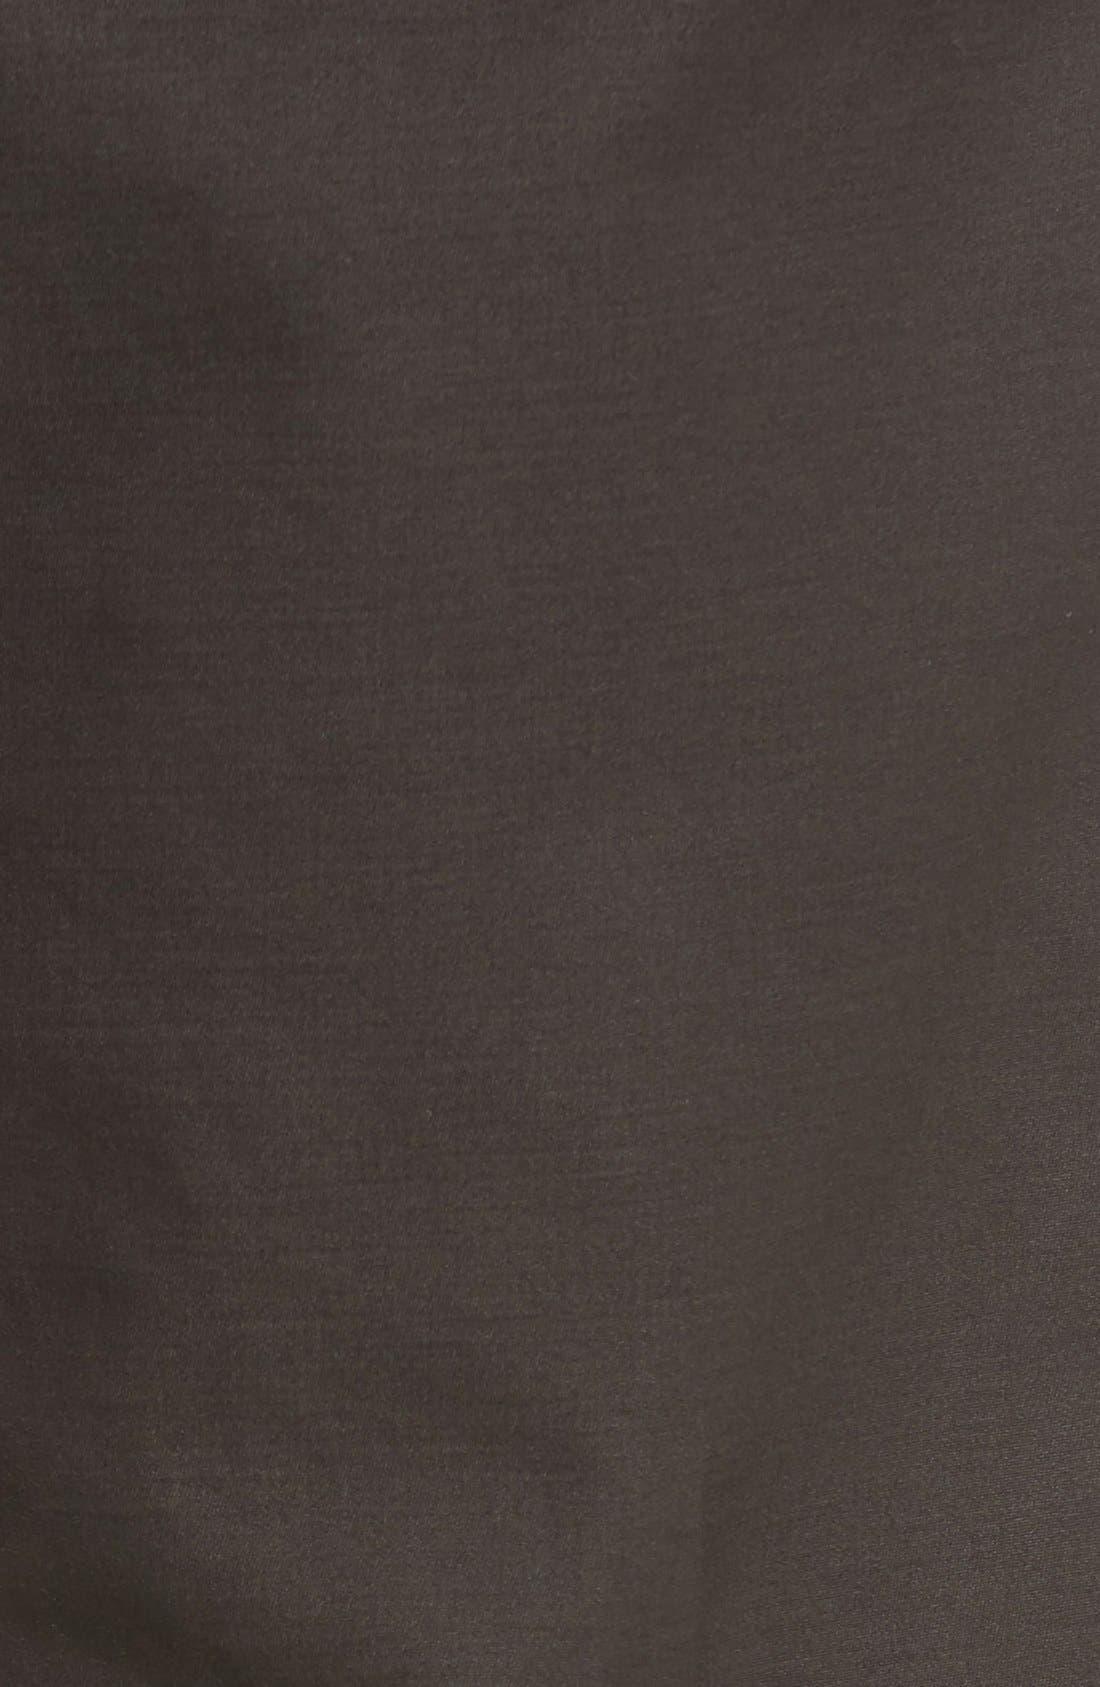 Slim Fit Five-Pocket Pants,                             Alternate thumbnail 5, color,                             020